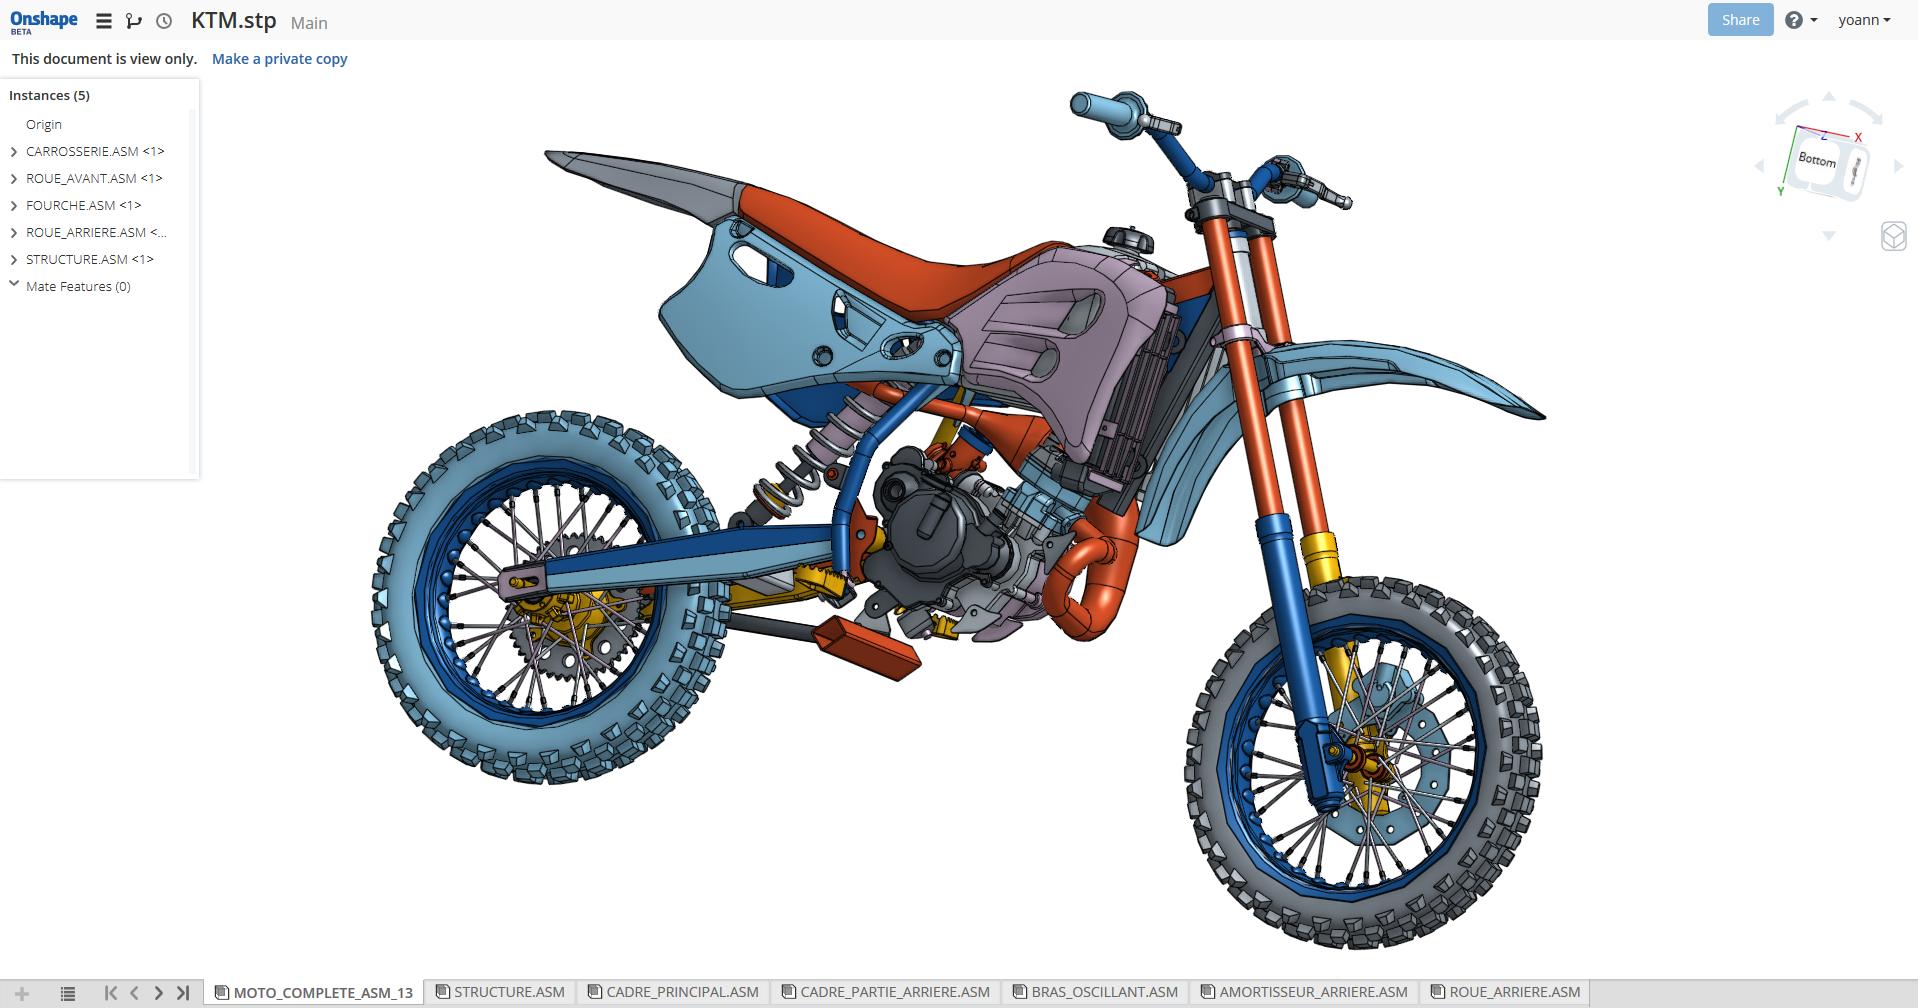 OnShape Motorbike KTM